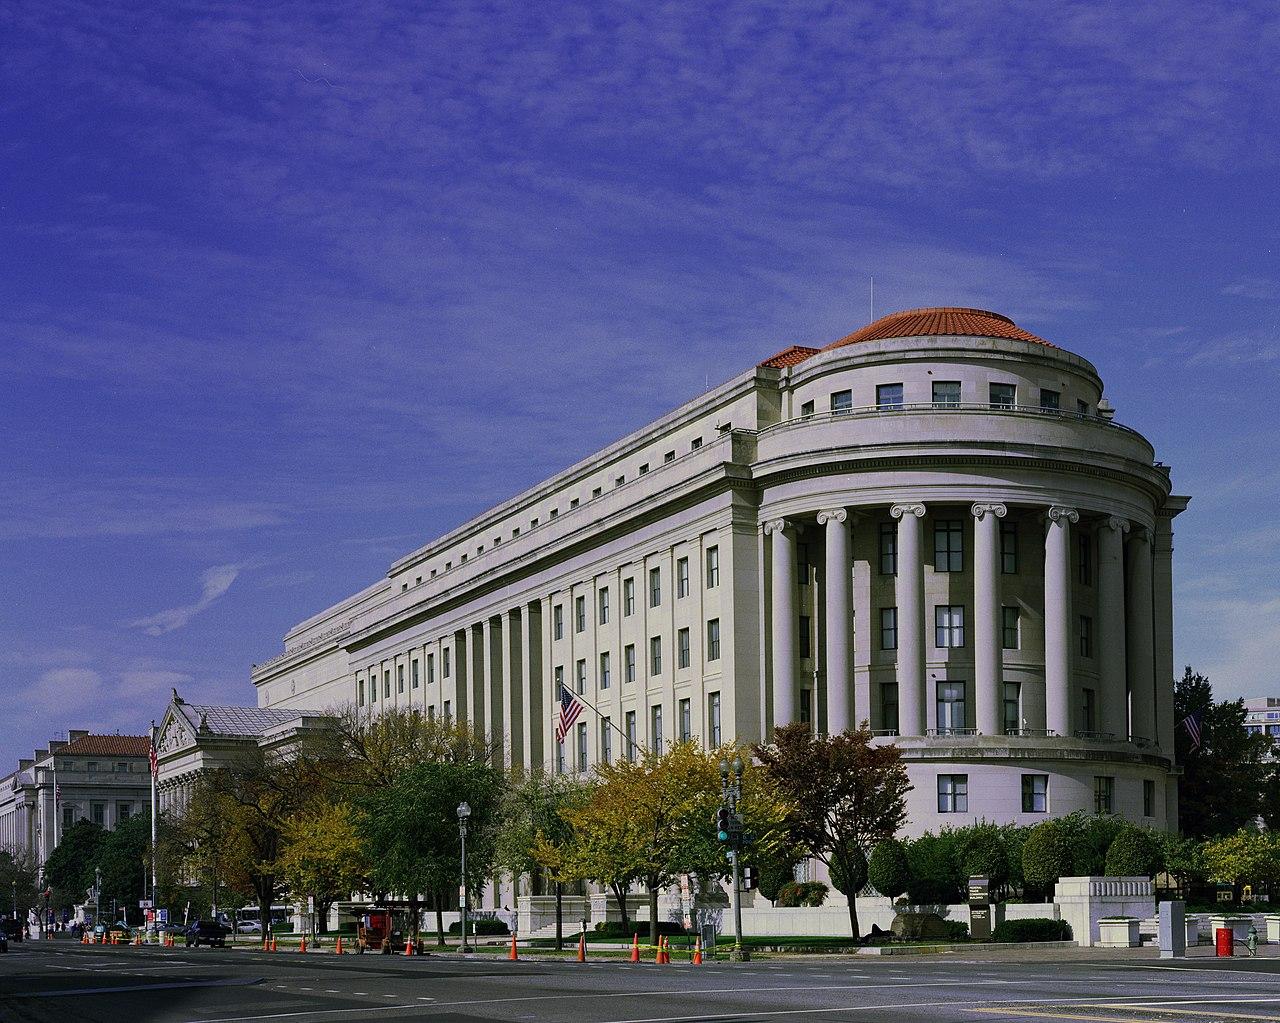 FTC headquarters in Washington, D.C. (Credit: Carol M. Highsmith/Wikipedia.)